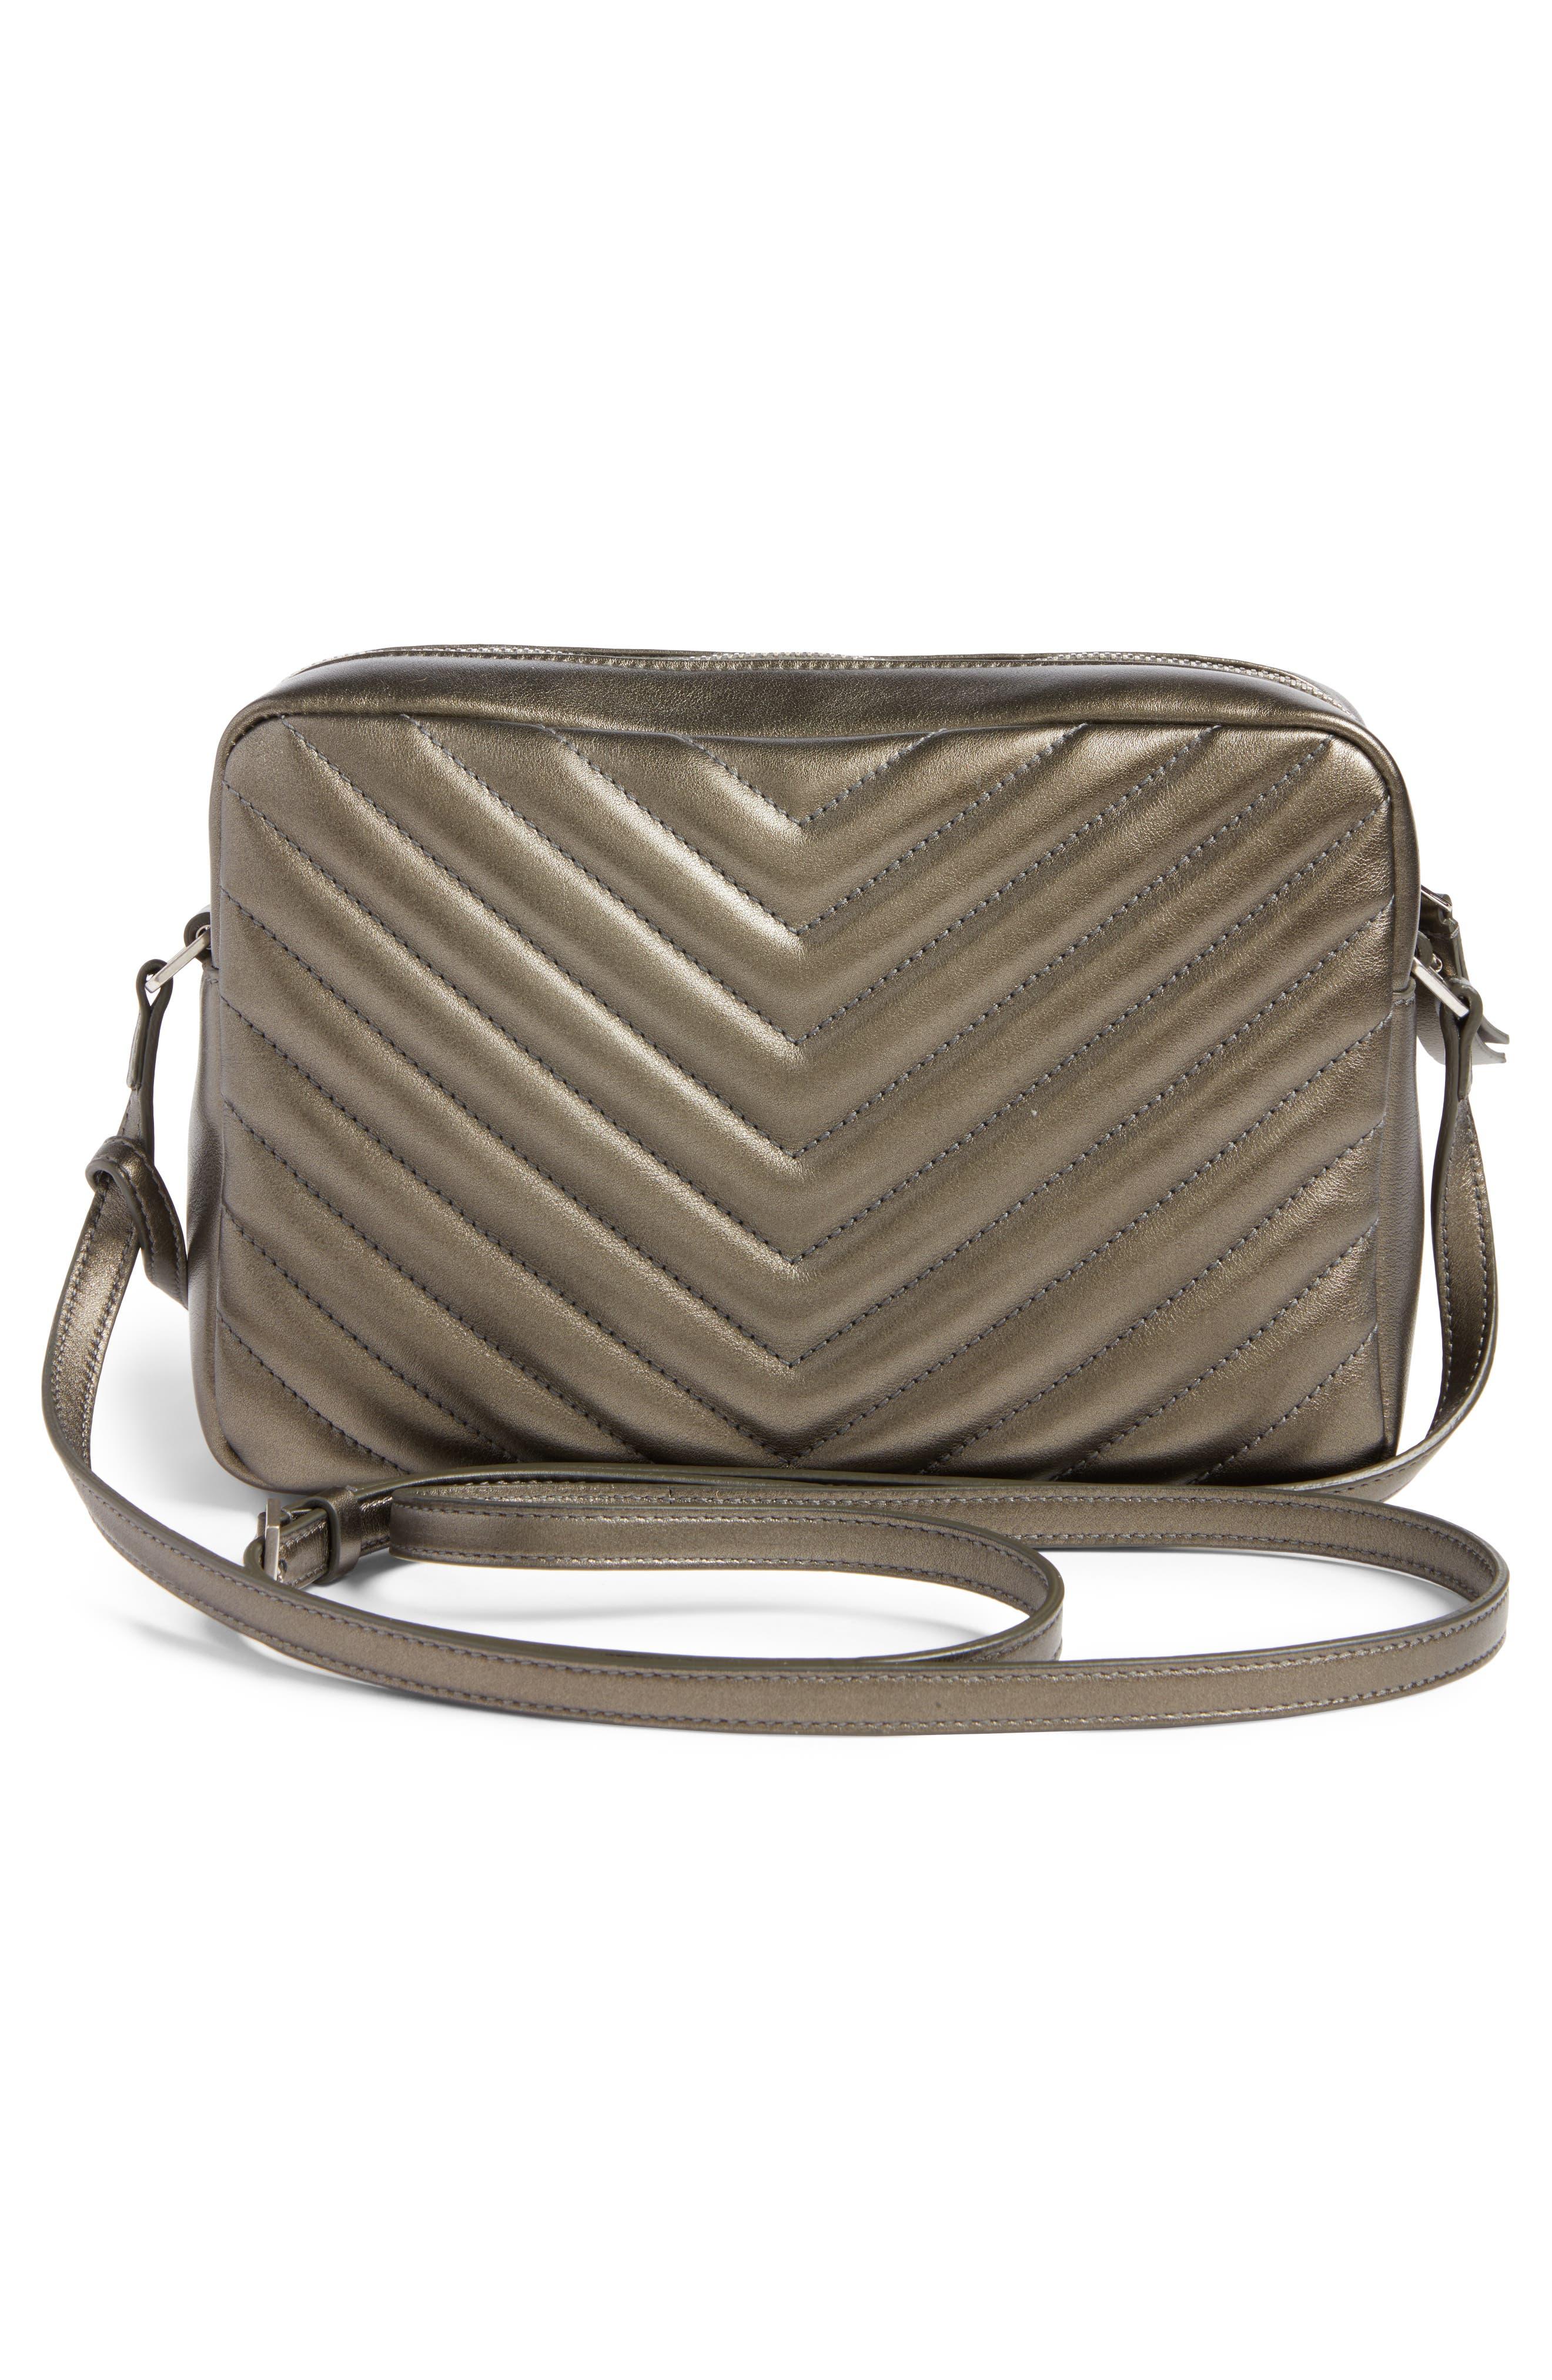 Medium Lou Calfskin Leather Camera Bag,                             Alternate thumbnail 3, color,                             020